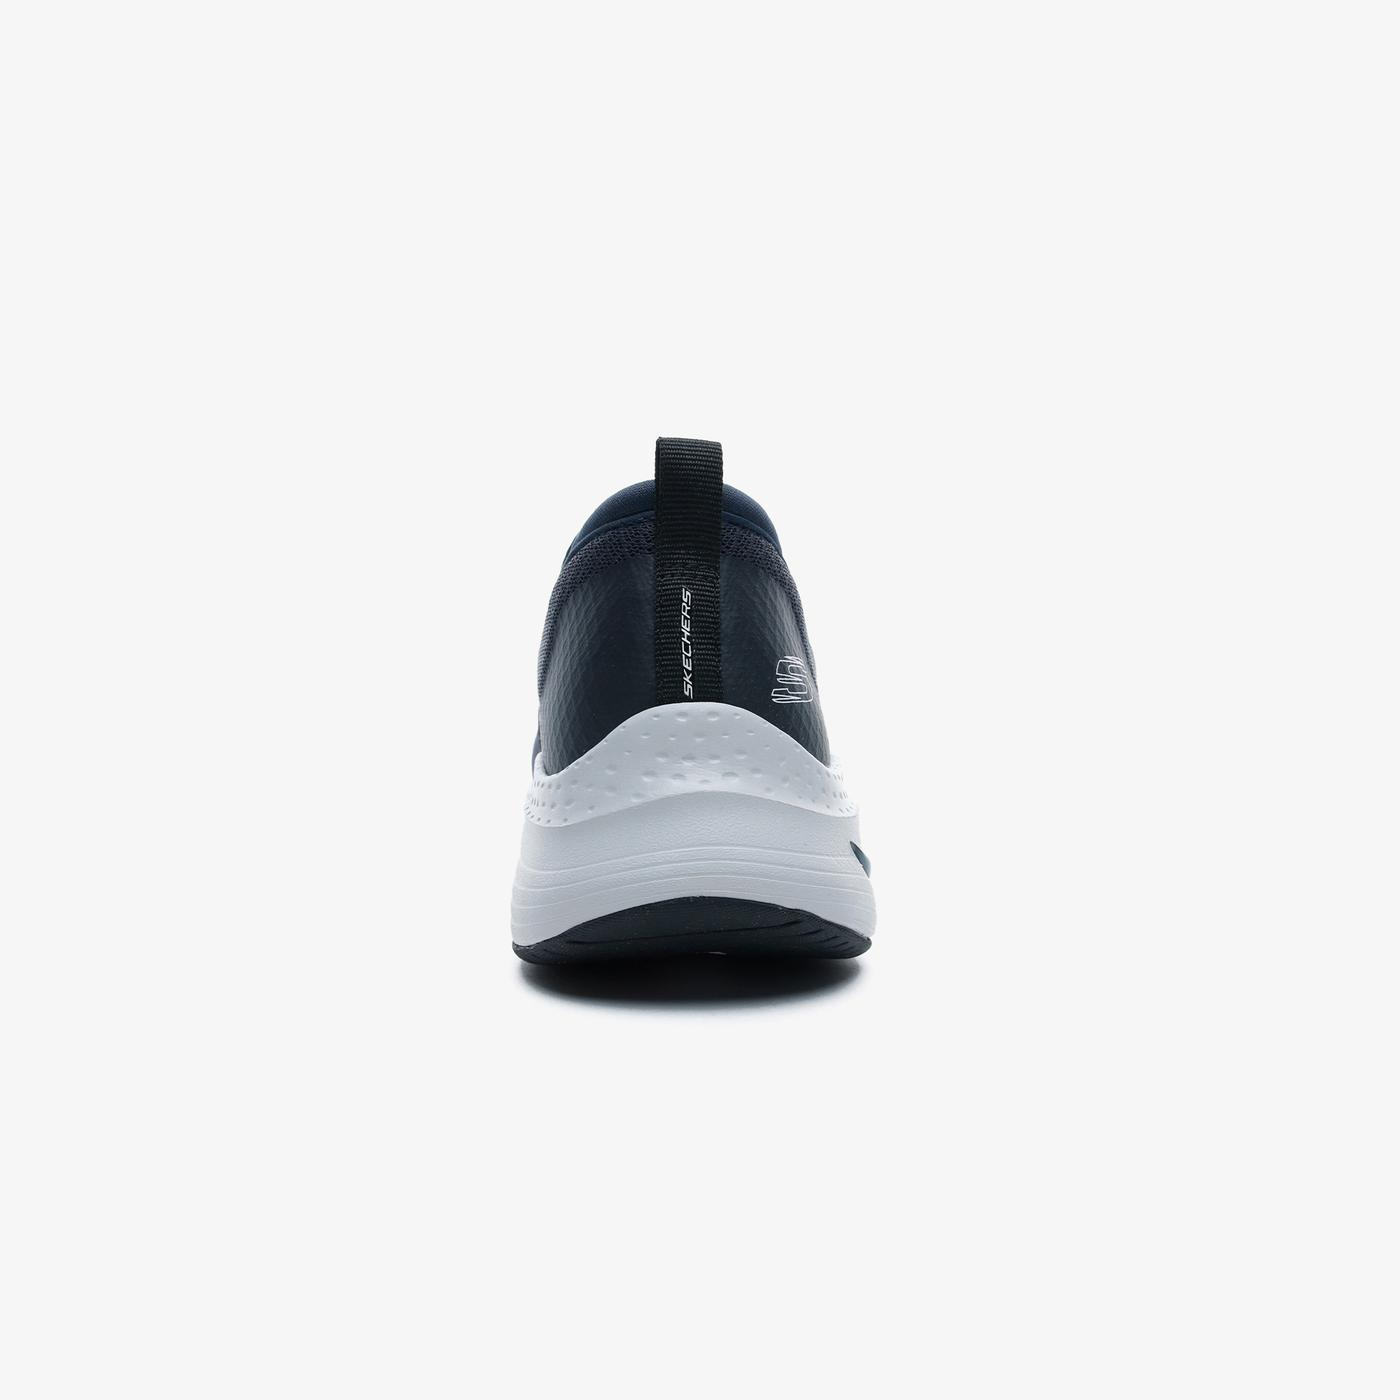 Skechers Arch Fit-Banlin Erkek Lacivert Spor Ayakkabı